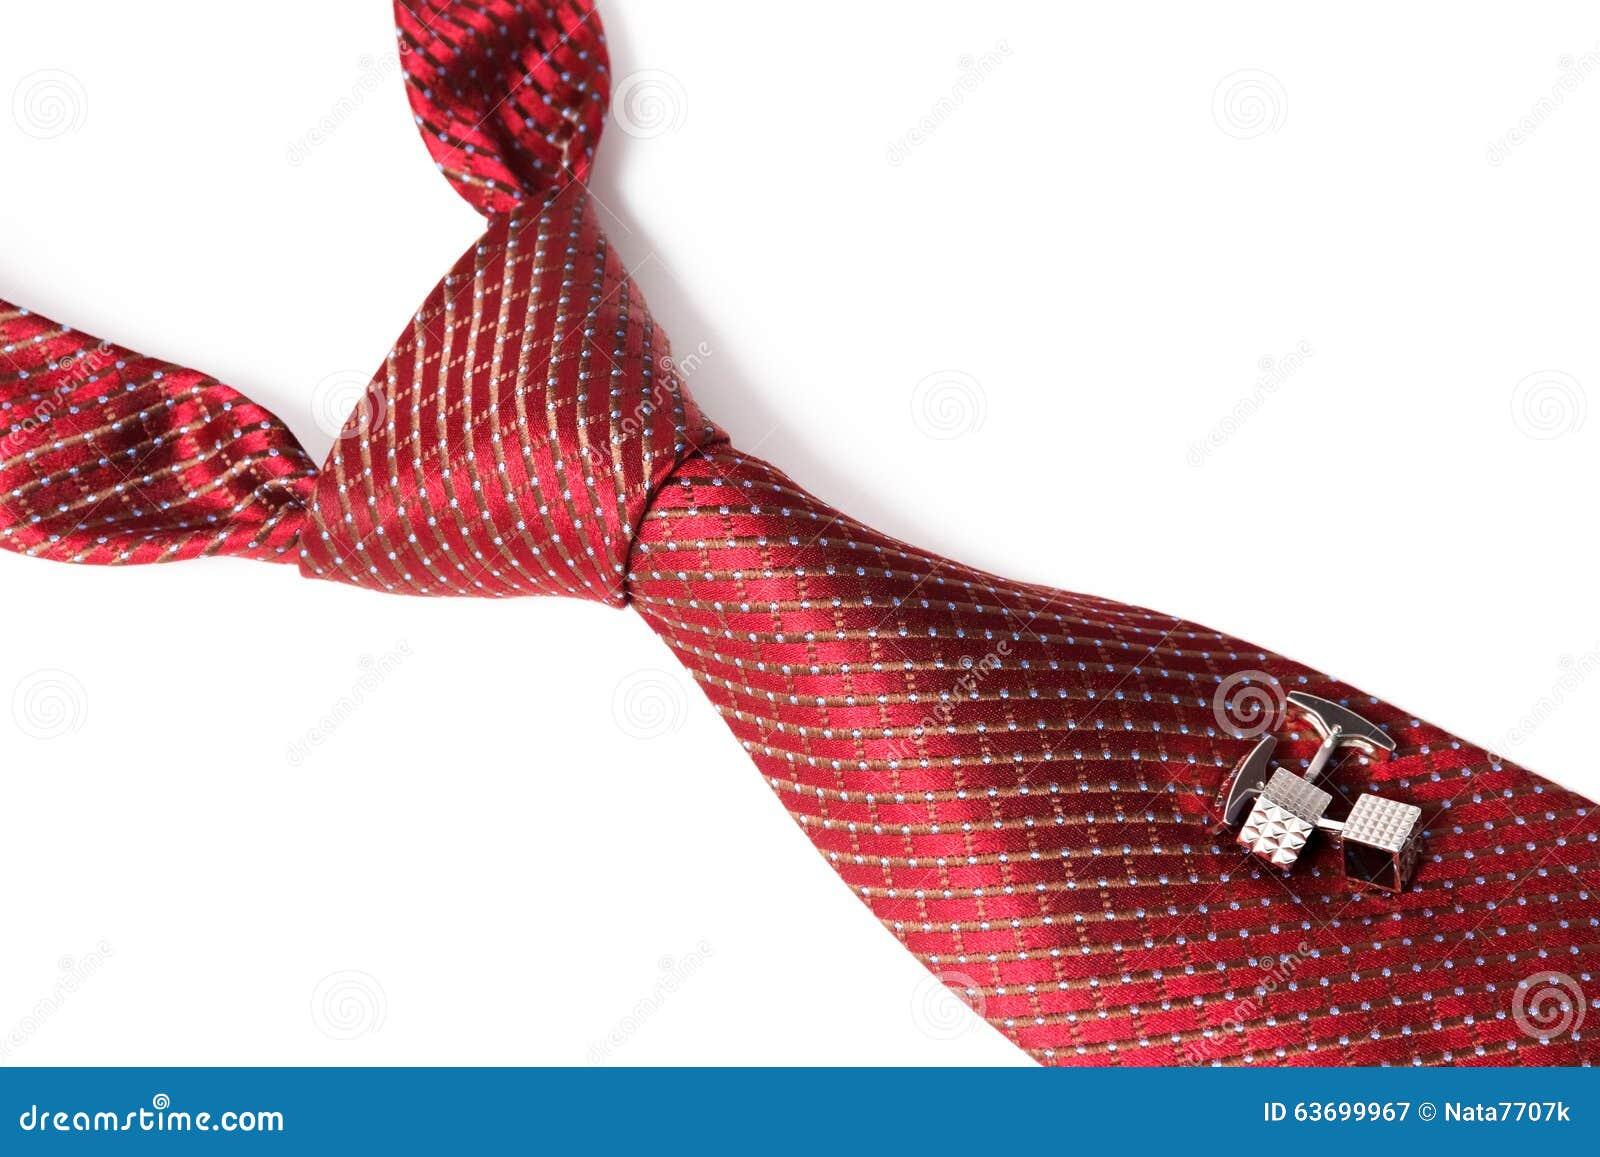 Красная завязанная связь, двойному Виндзору